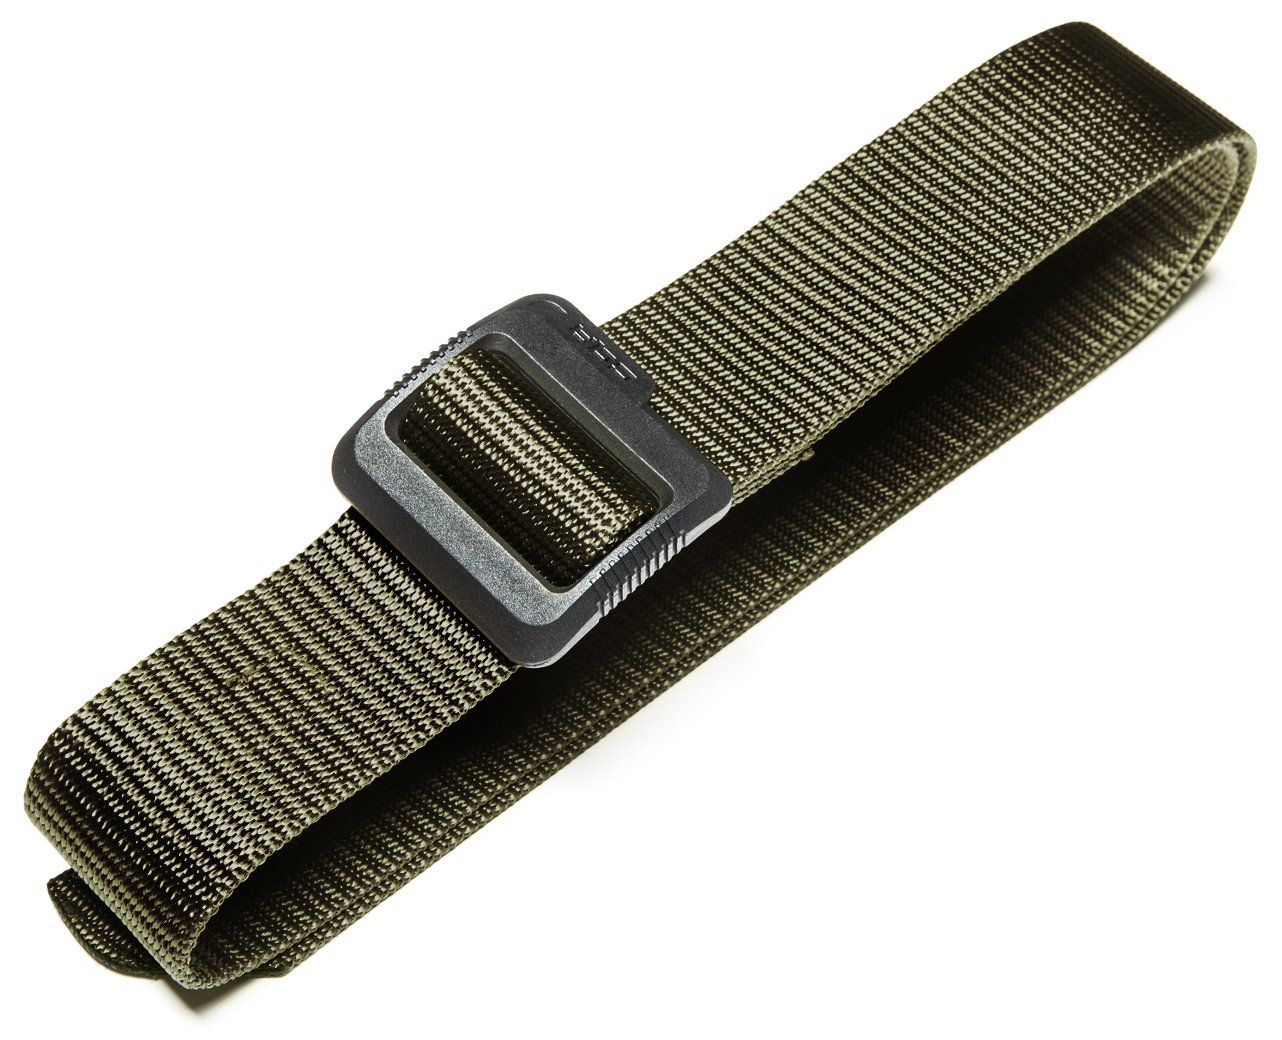 CQR CQ-MZT01-GRN_S(w28-30) Tactical Belt 100% Full Refund Assurance Nylon Webbing EDC Duty 1.5'' Belt MZT01 by CQR (Image #5)